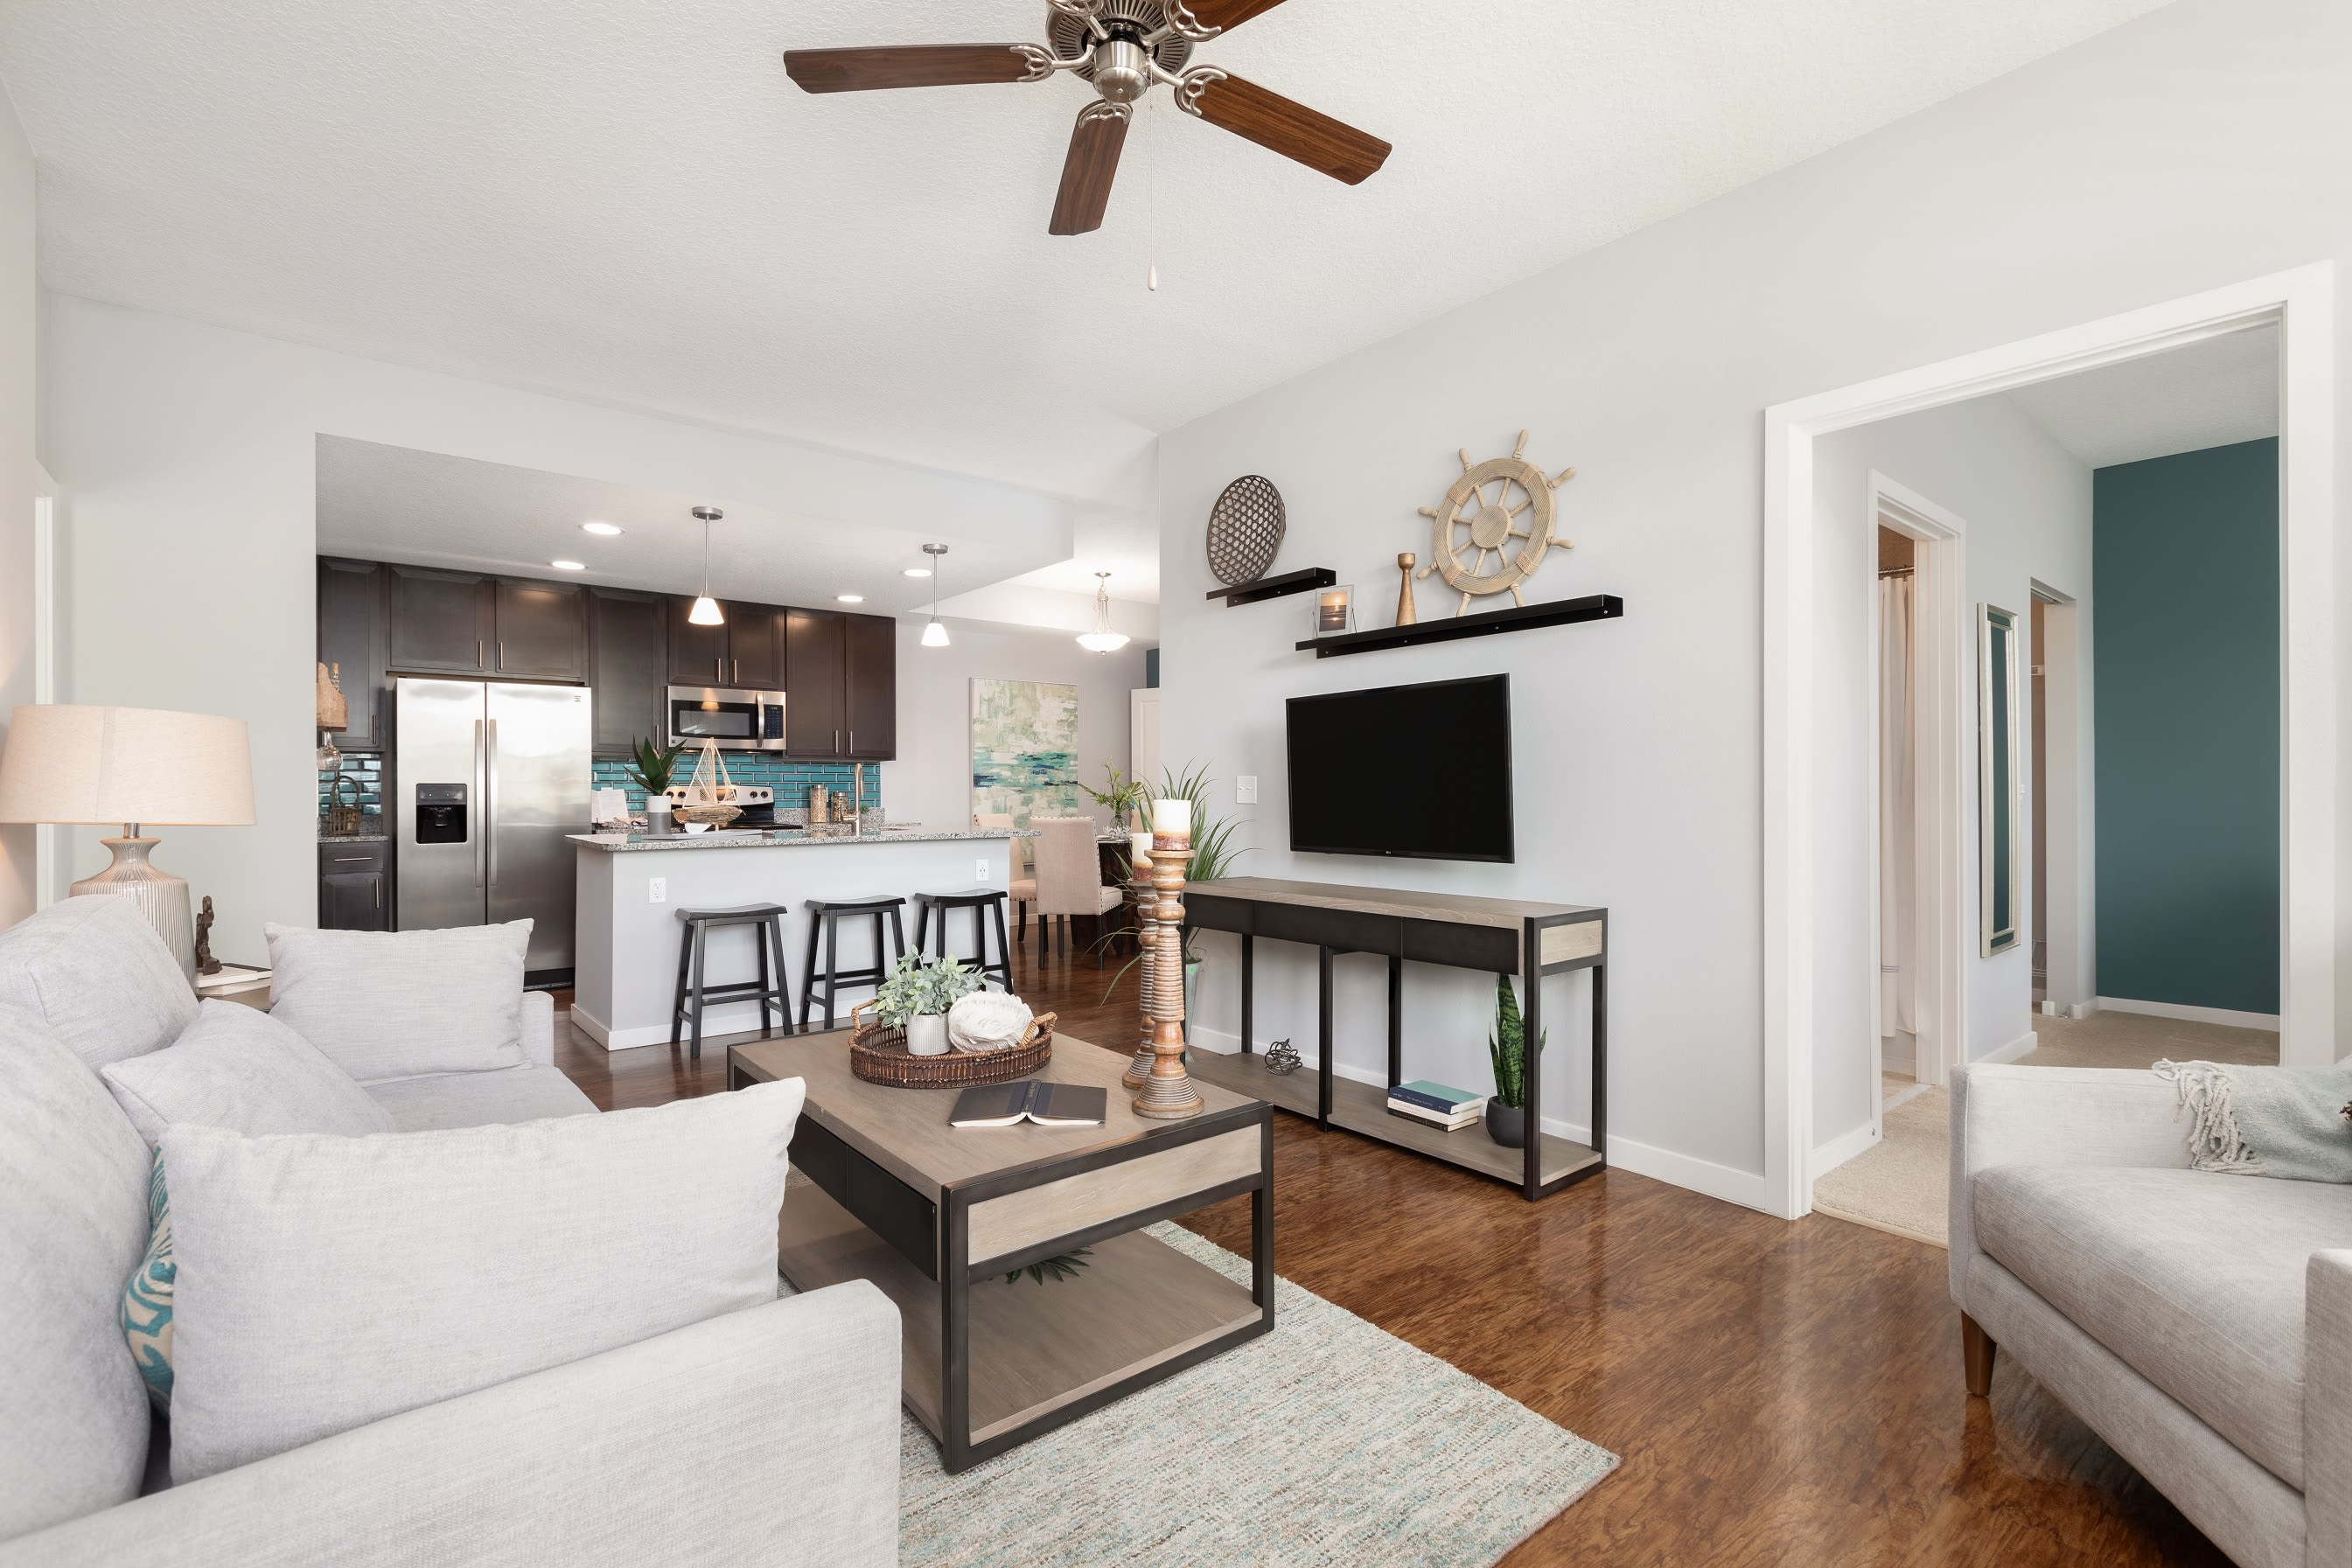 Open concept layout with hardwood floors at High Ridge Landing in Boynton Beach, Florida